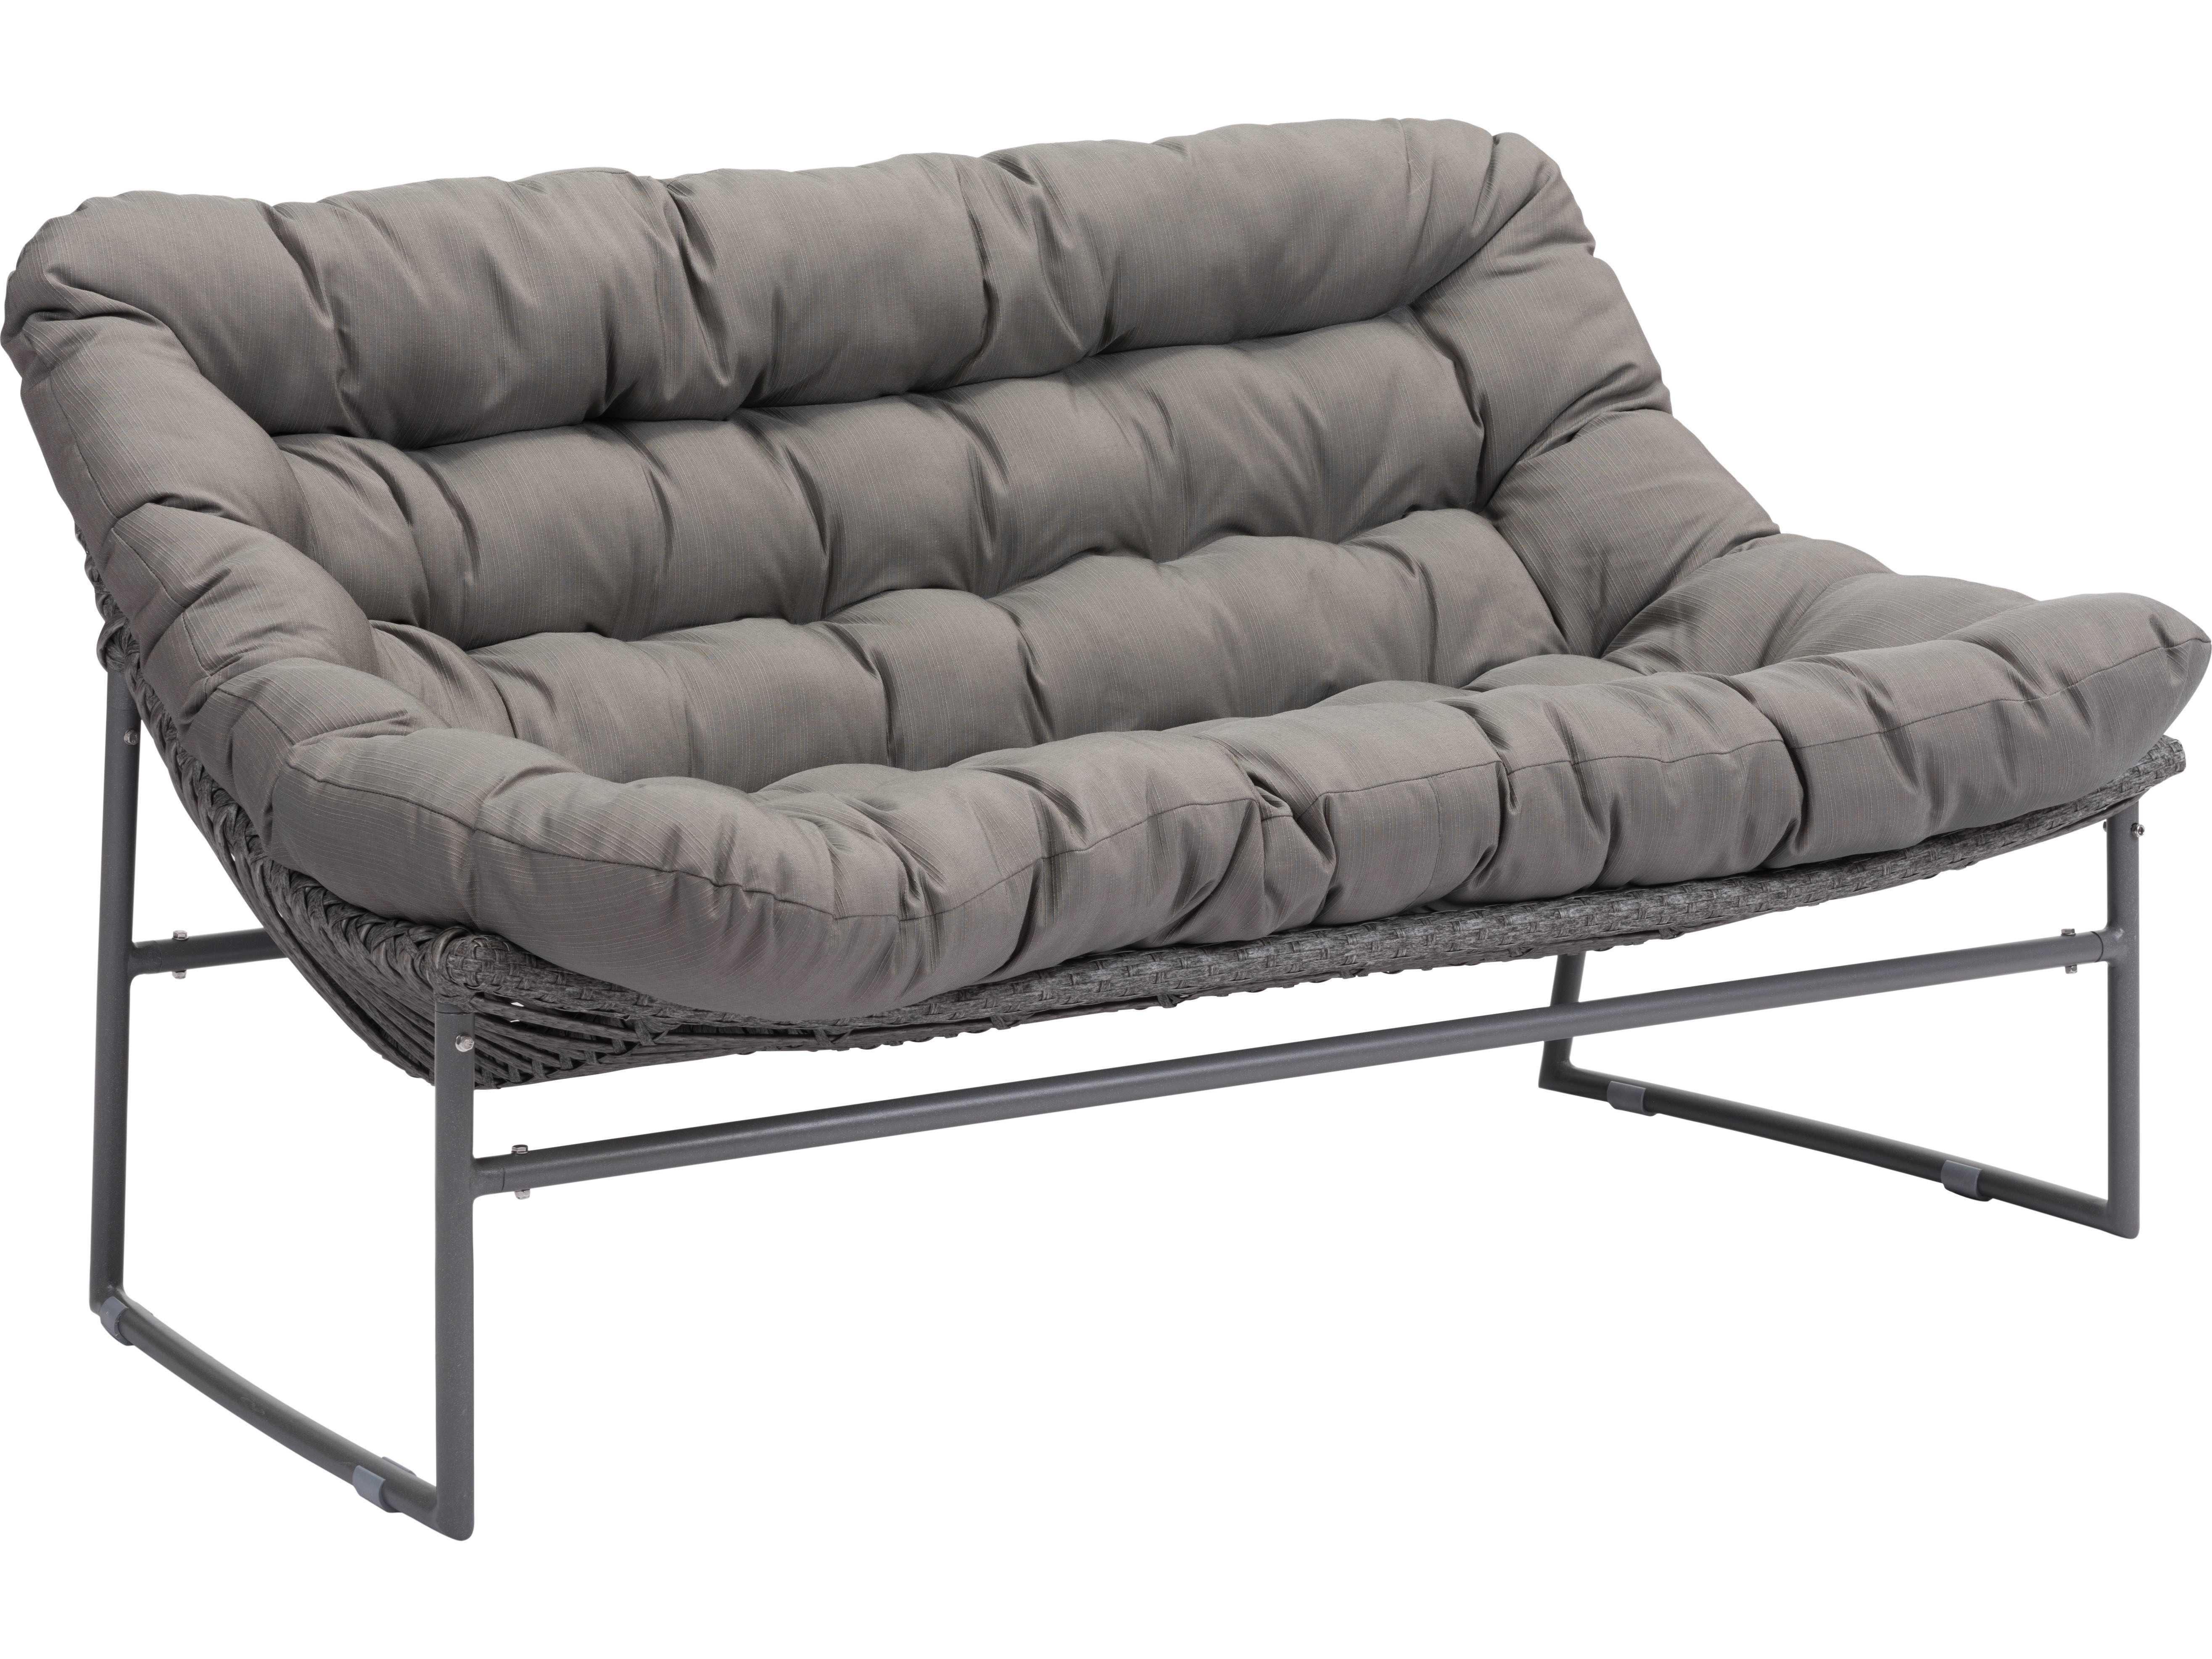 100 Zuo Outdoor Furniture 100 Zuo Modern Outdoor Furniture Woven Courtyard Elegance